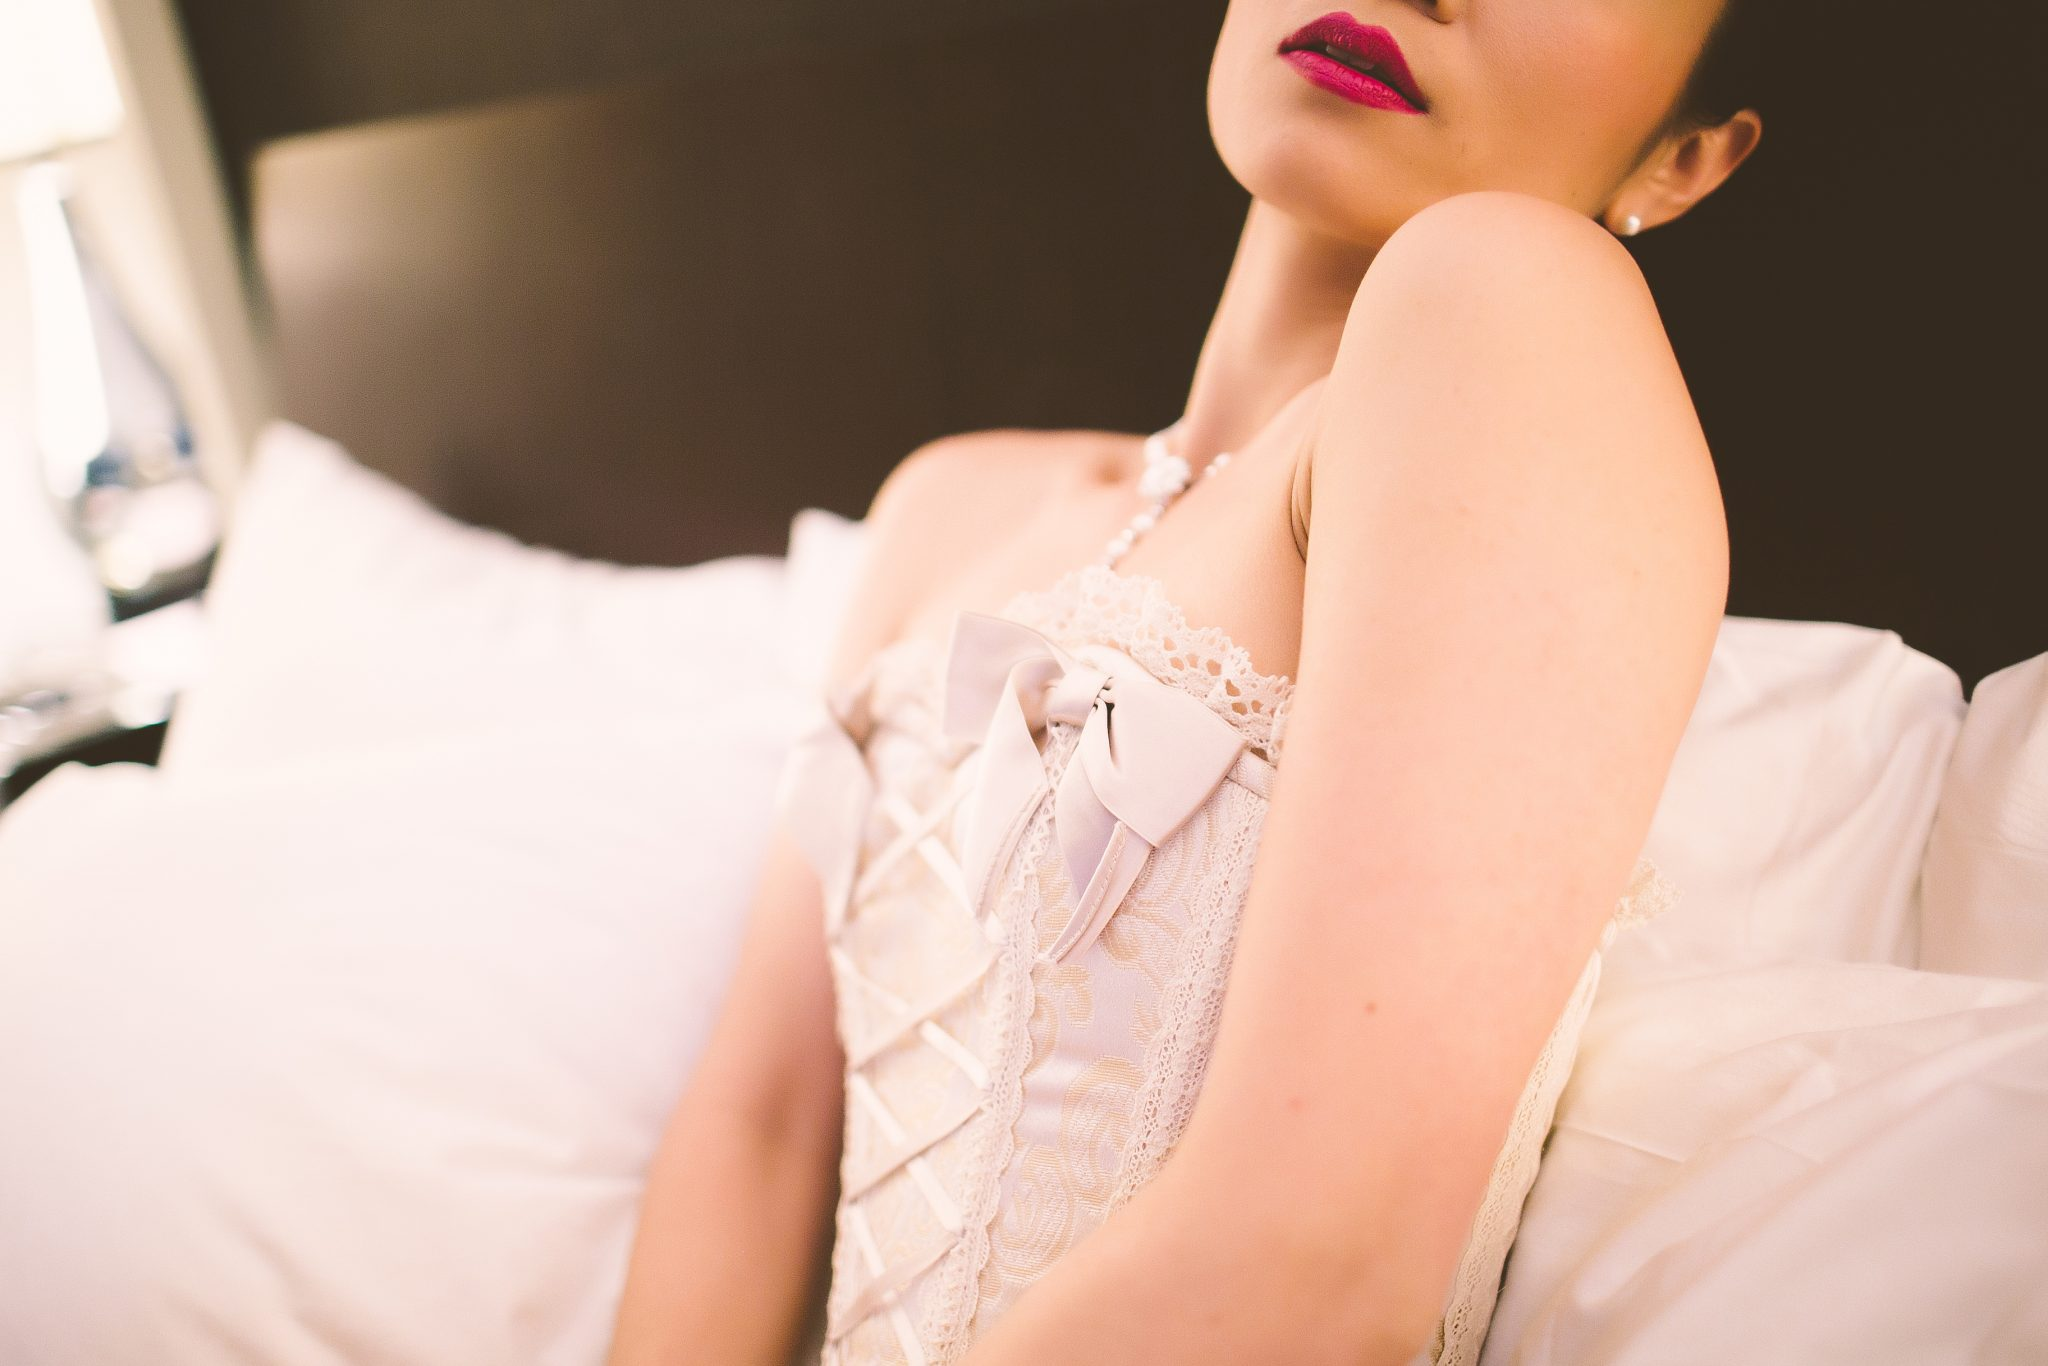 An up close shot of a model for a professional boudoir album